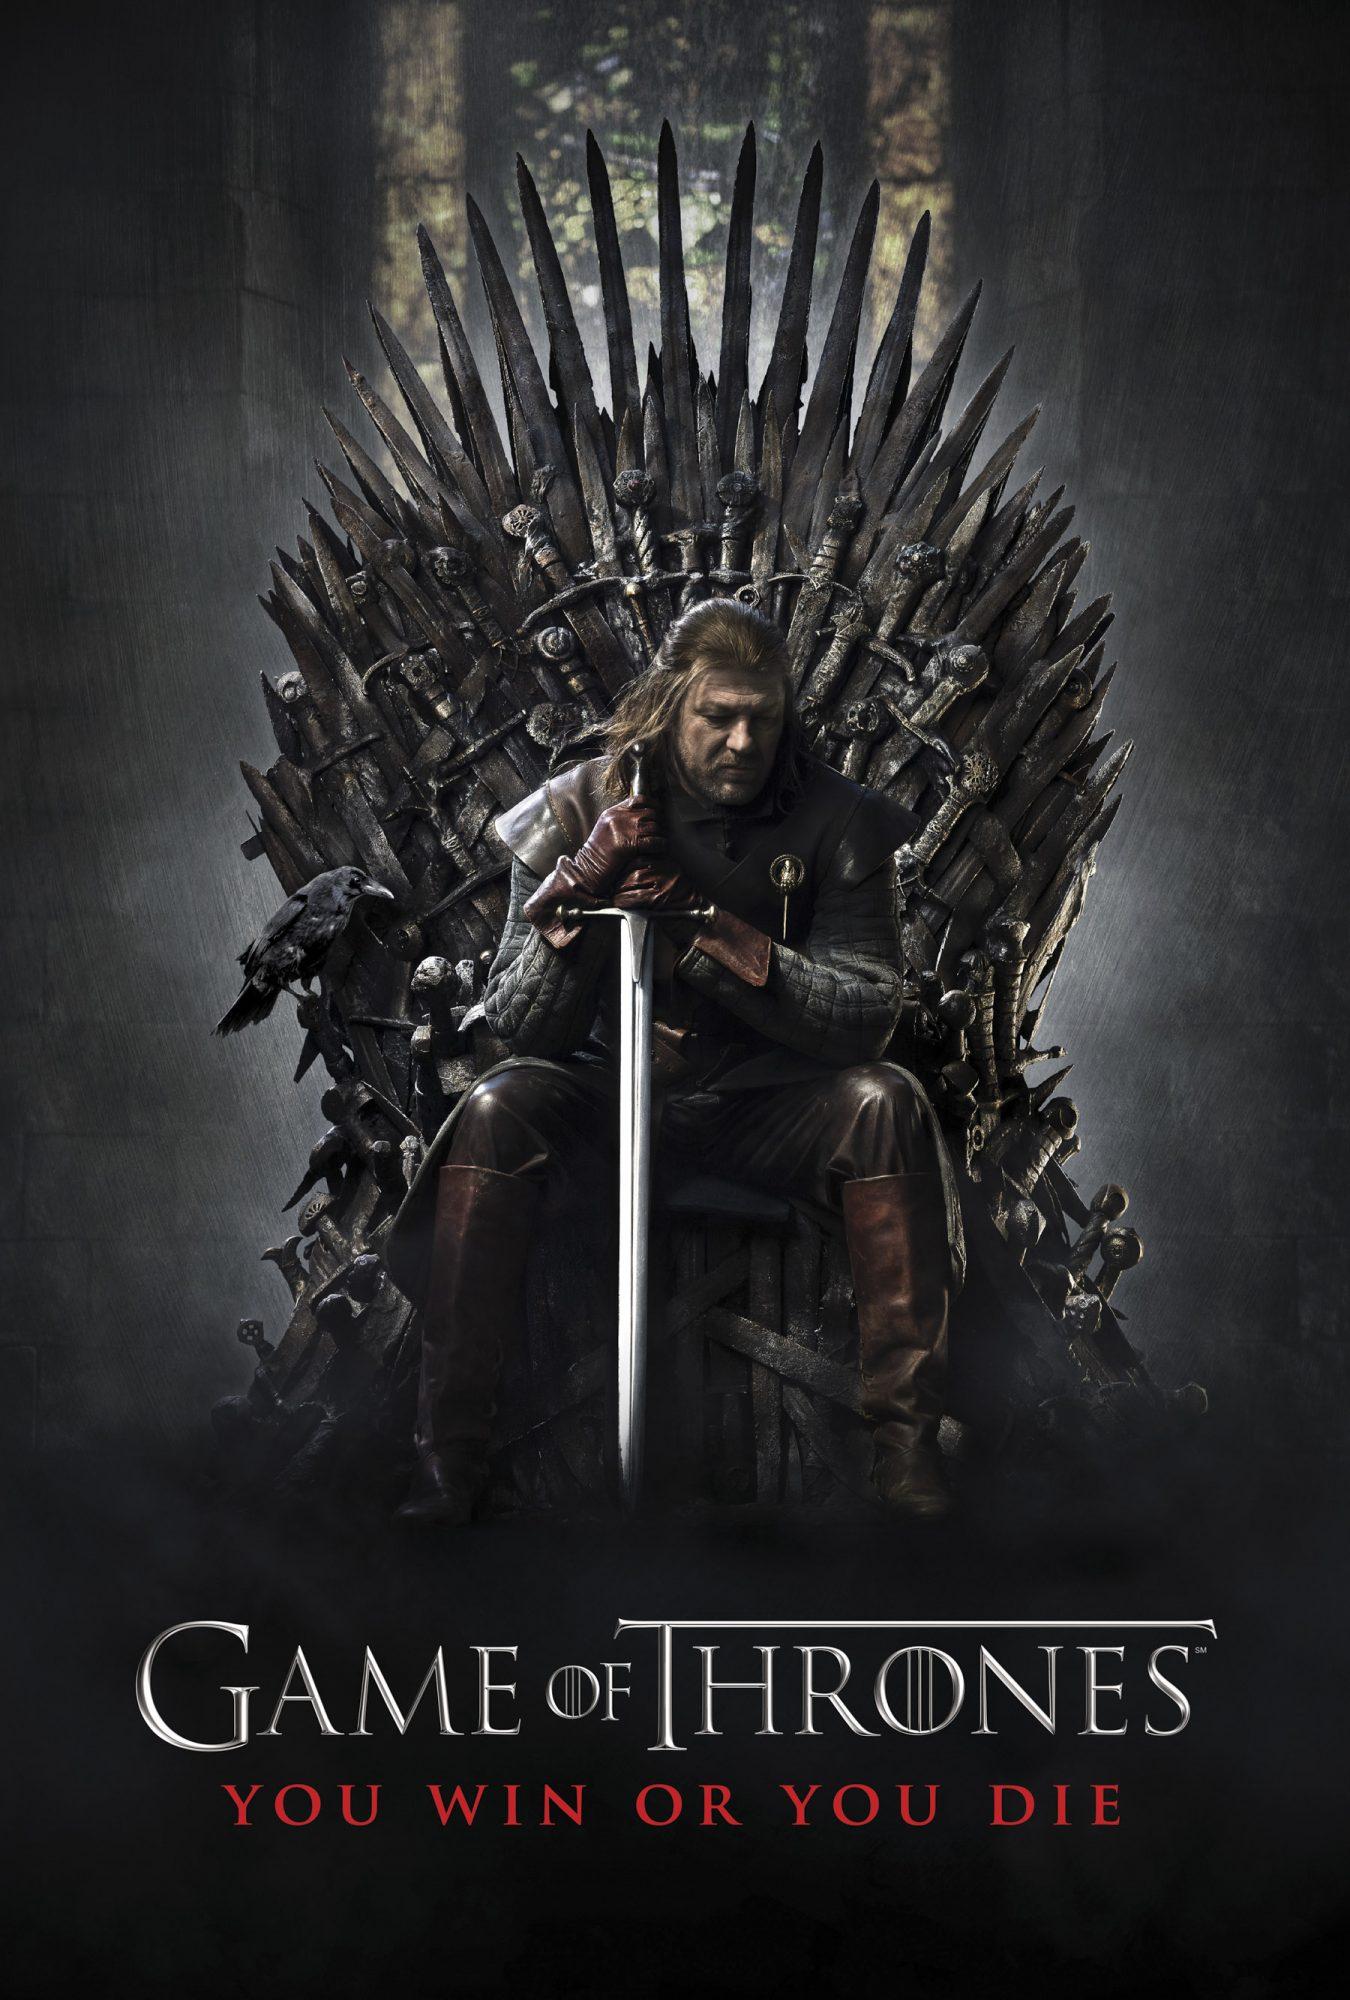 Game of Thrones poster/key artSeason 1CR: HBO